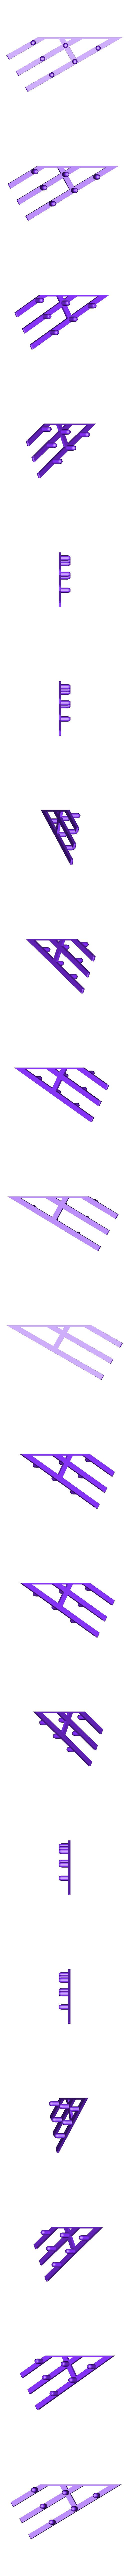 Romulan_harness_Tal_Shiar_extension.stl Download free STL file Romulan Harness • 3D print template, poblocki1982